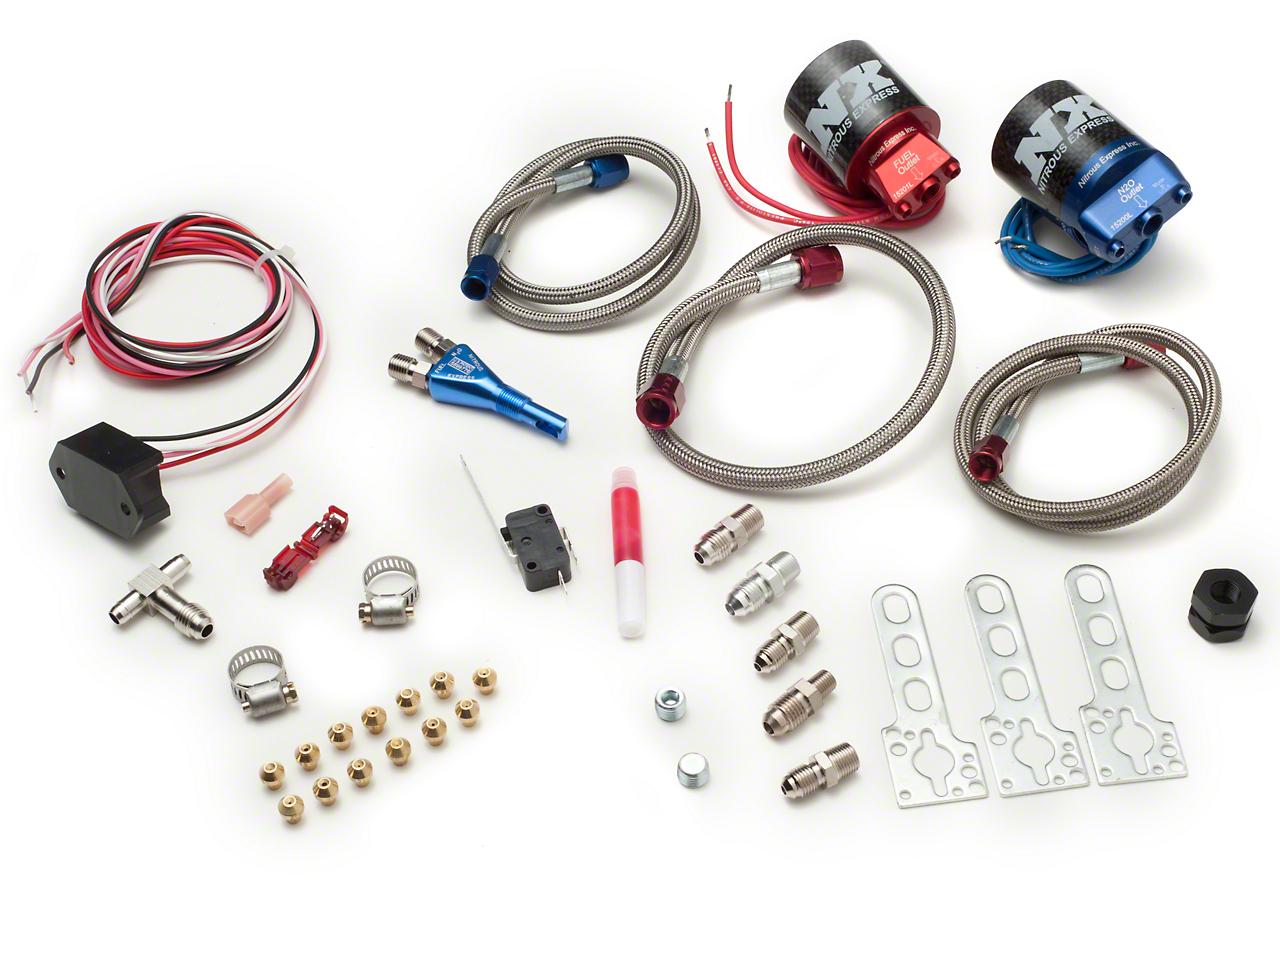 Nitrous Express Coyote Nitrous Kit - Nozzle System (11-14 GT)